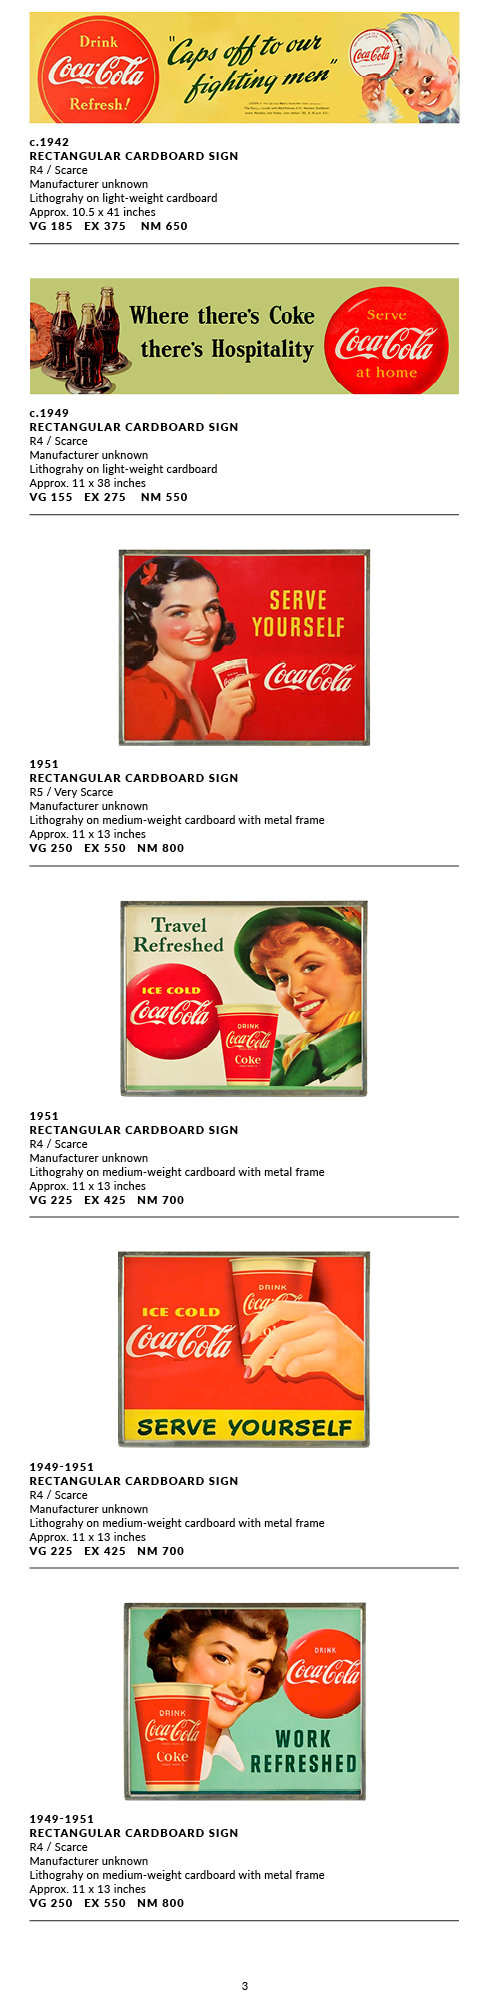 2018_1940-1969RectCardboards3.jpg